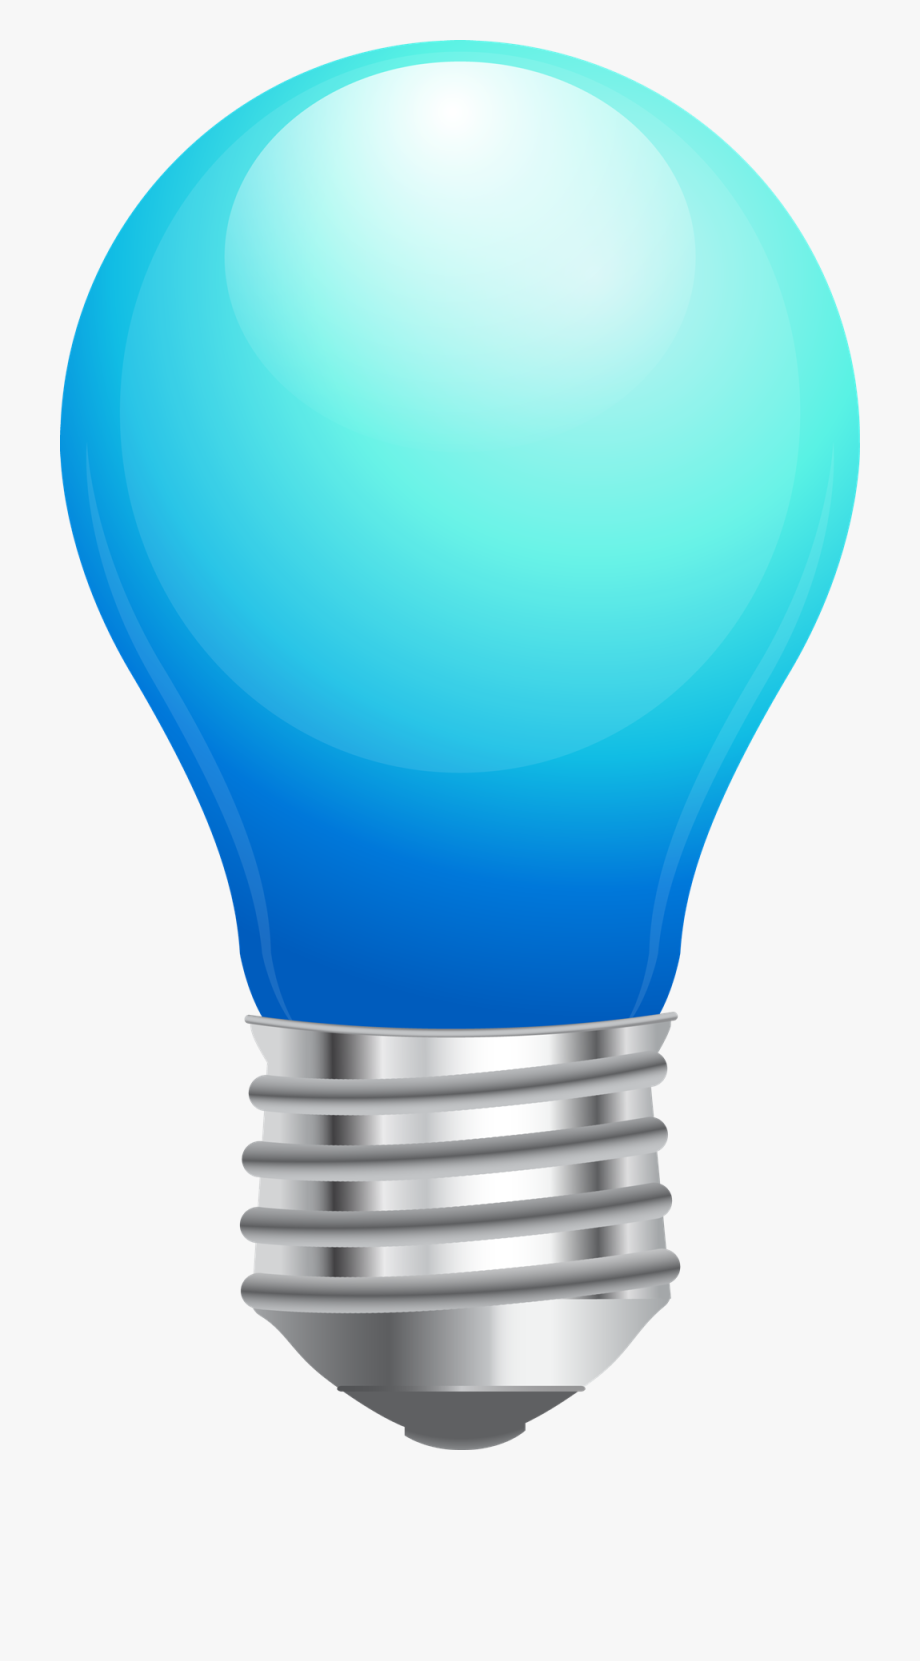 Bulb clip art free. Lamp clipart light globe